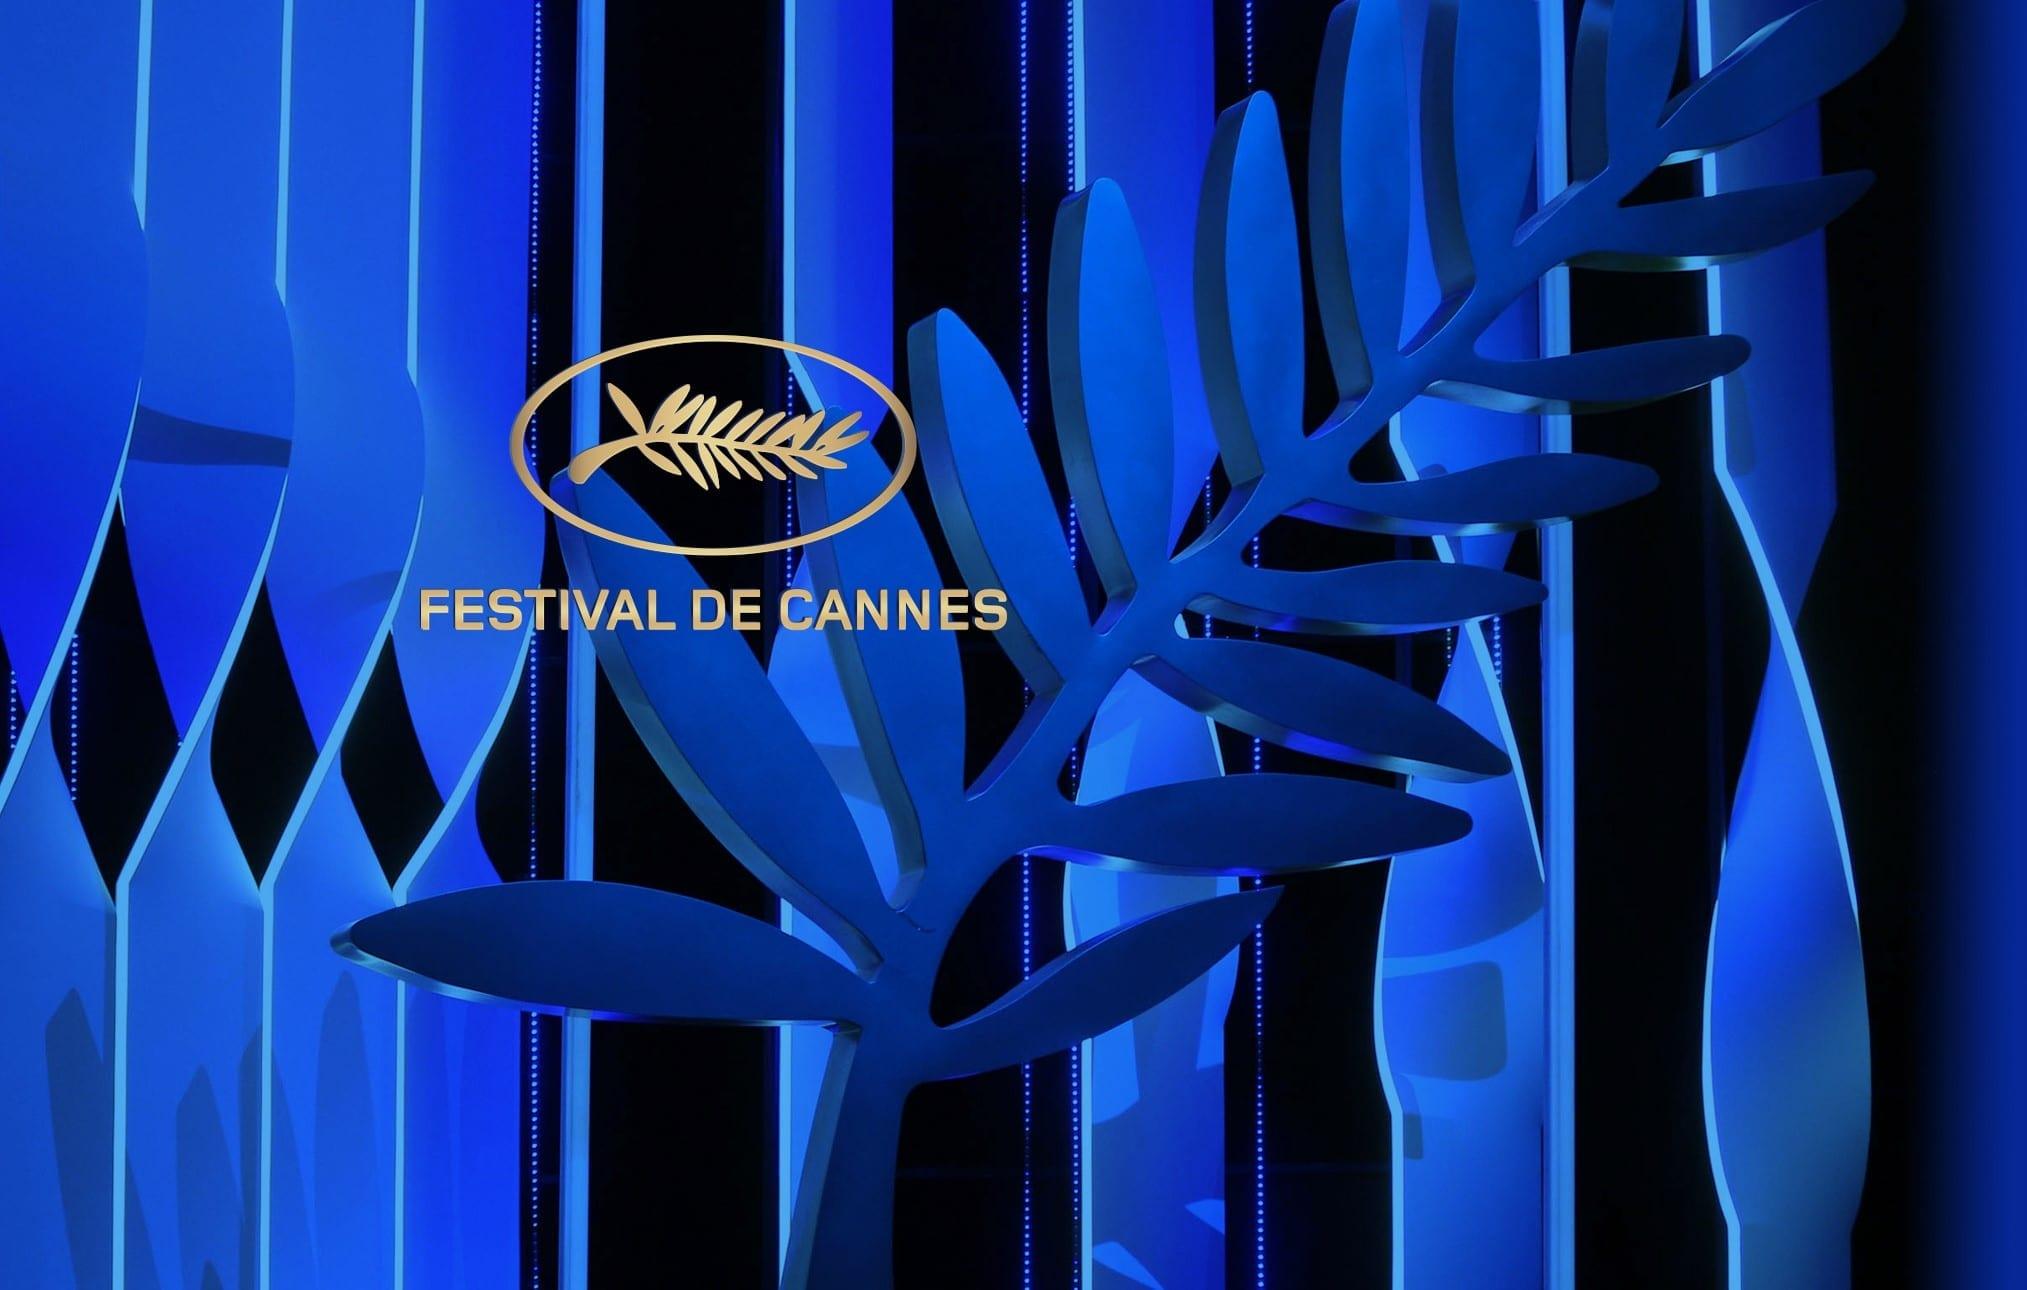 cannes film festival 2020 lineup